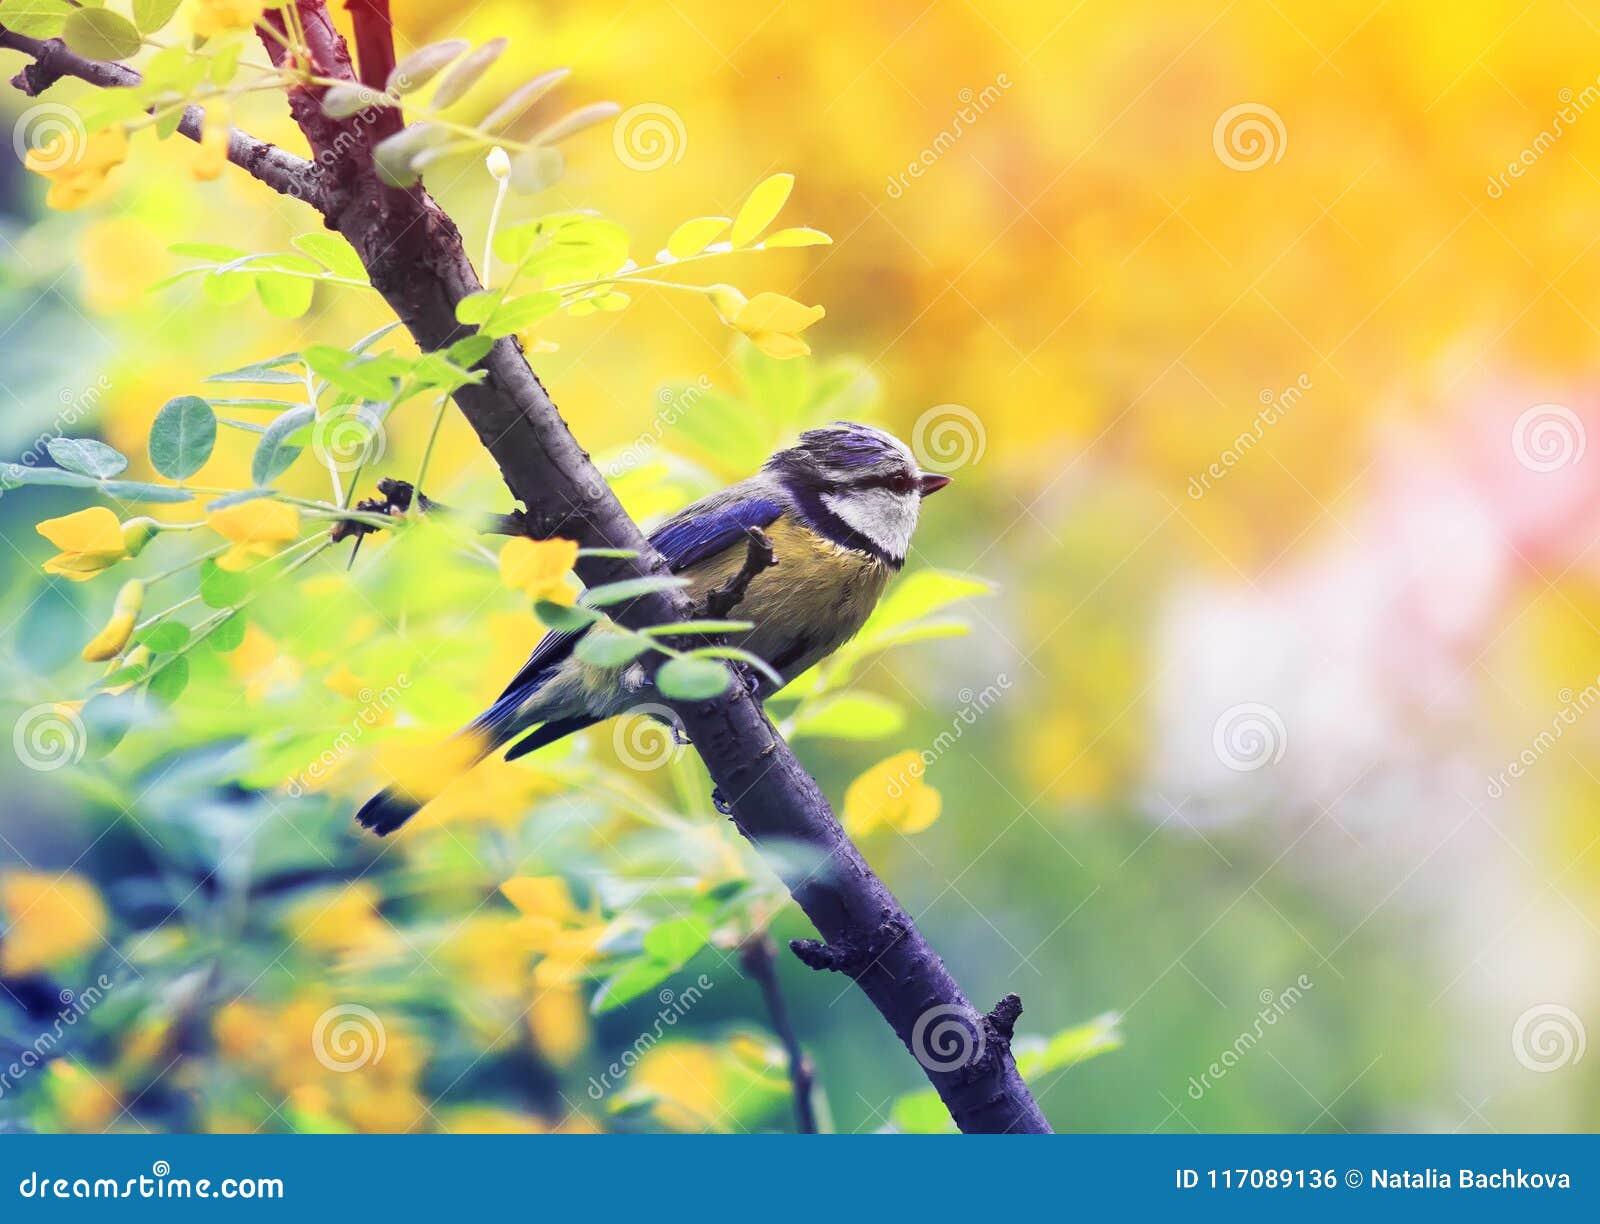 Bright blue tit bird sits on a flowering Bush of acacia i